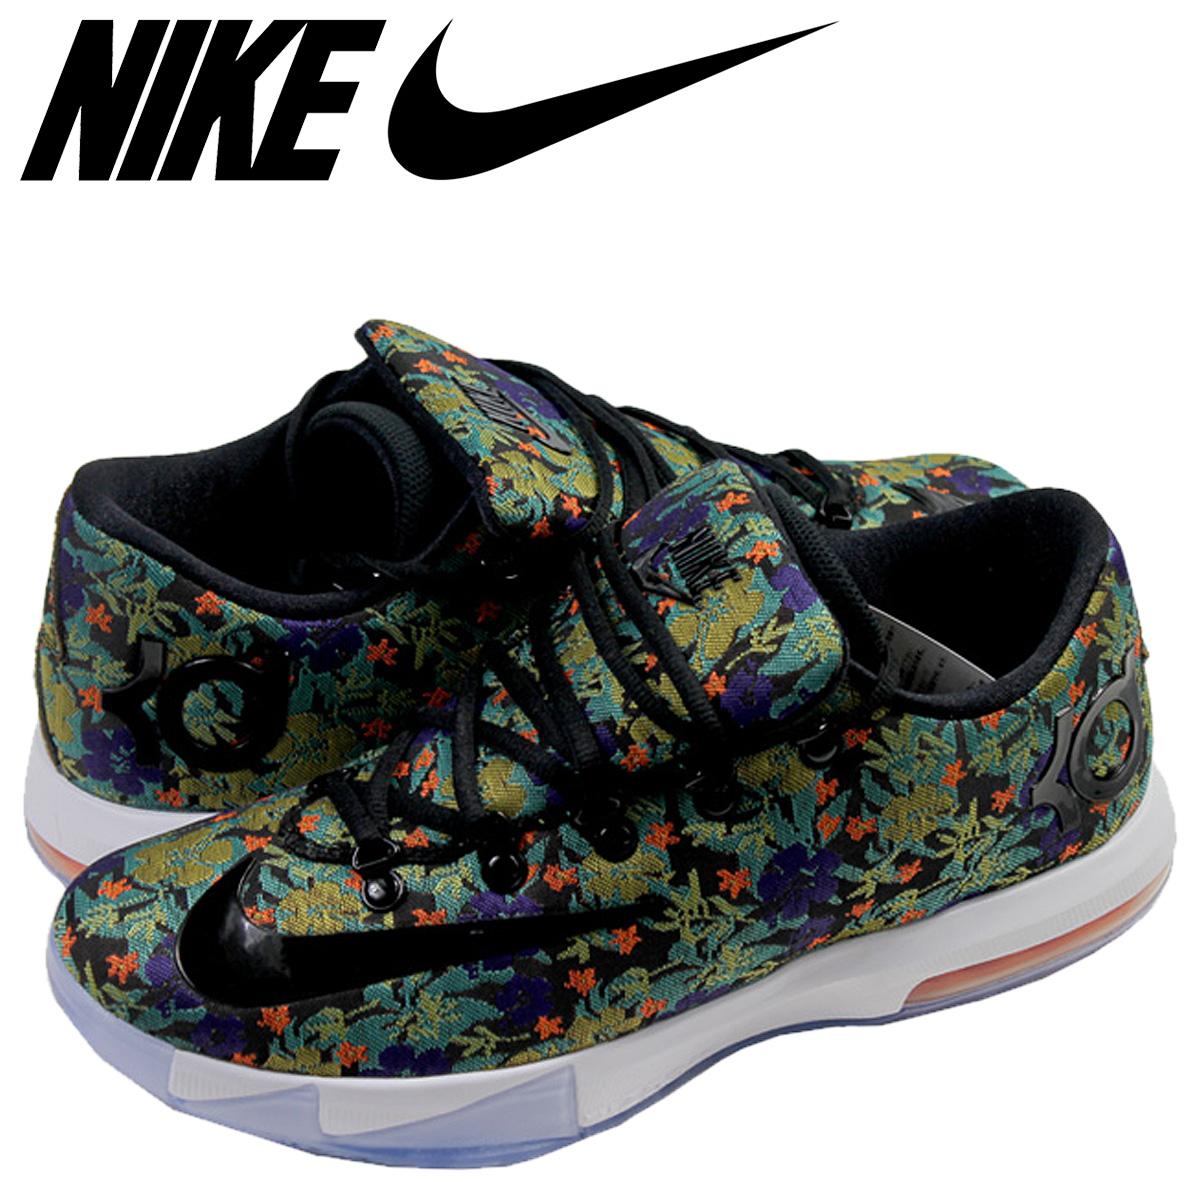 779491b512c8 Nike NIKE model sneakers KD VI EXT QS FLORAL Kevin Durant 6 floral 652120 -  900 multi men s